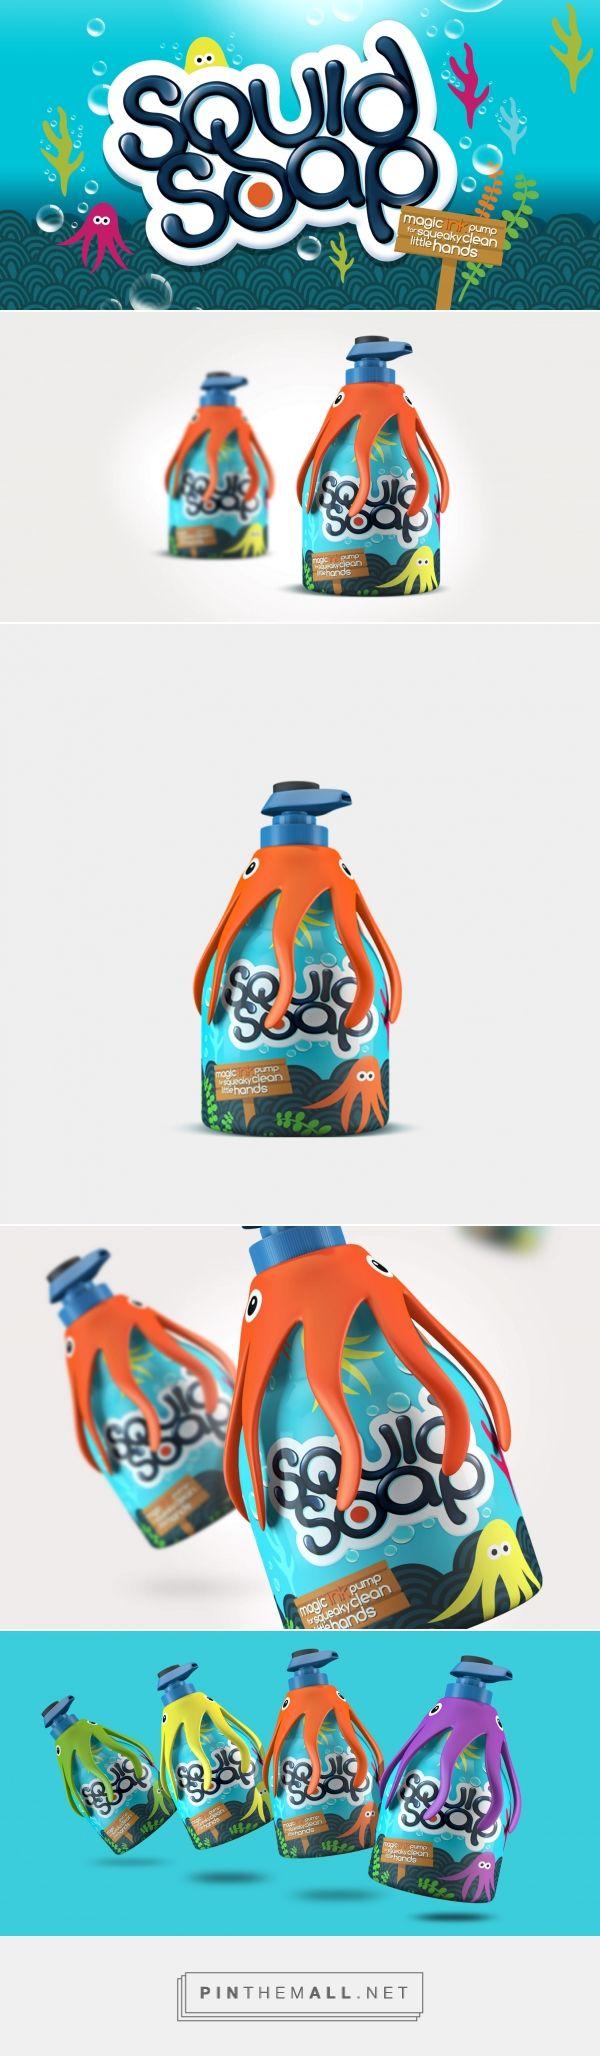 Squid Soap Kids - by Design Happy UK